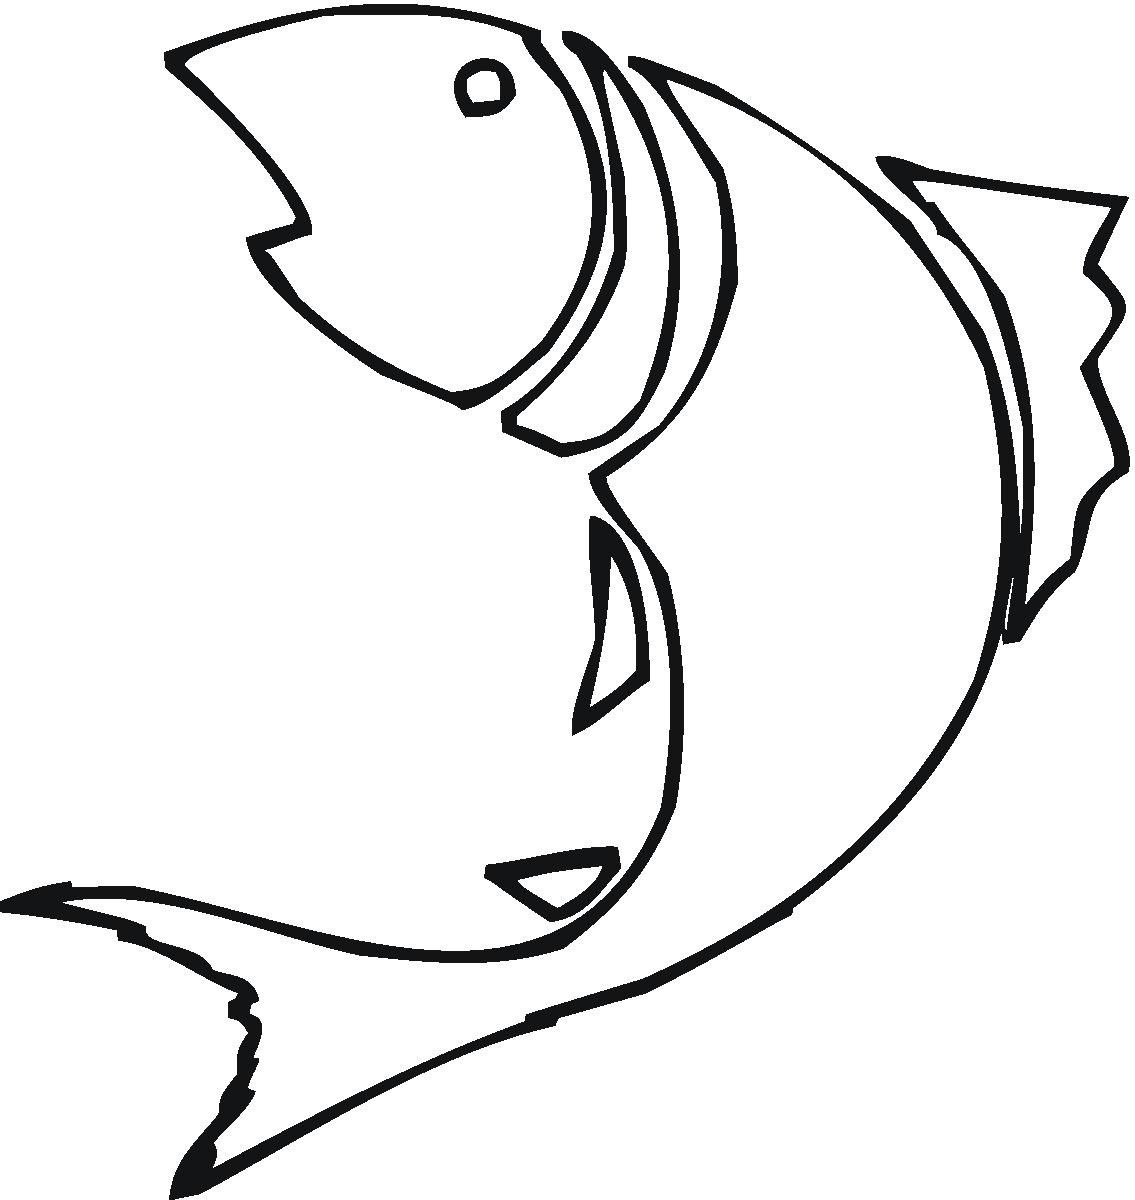 fish drawing outline clipart best cnc ideas pinterest fish